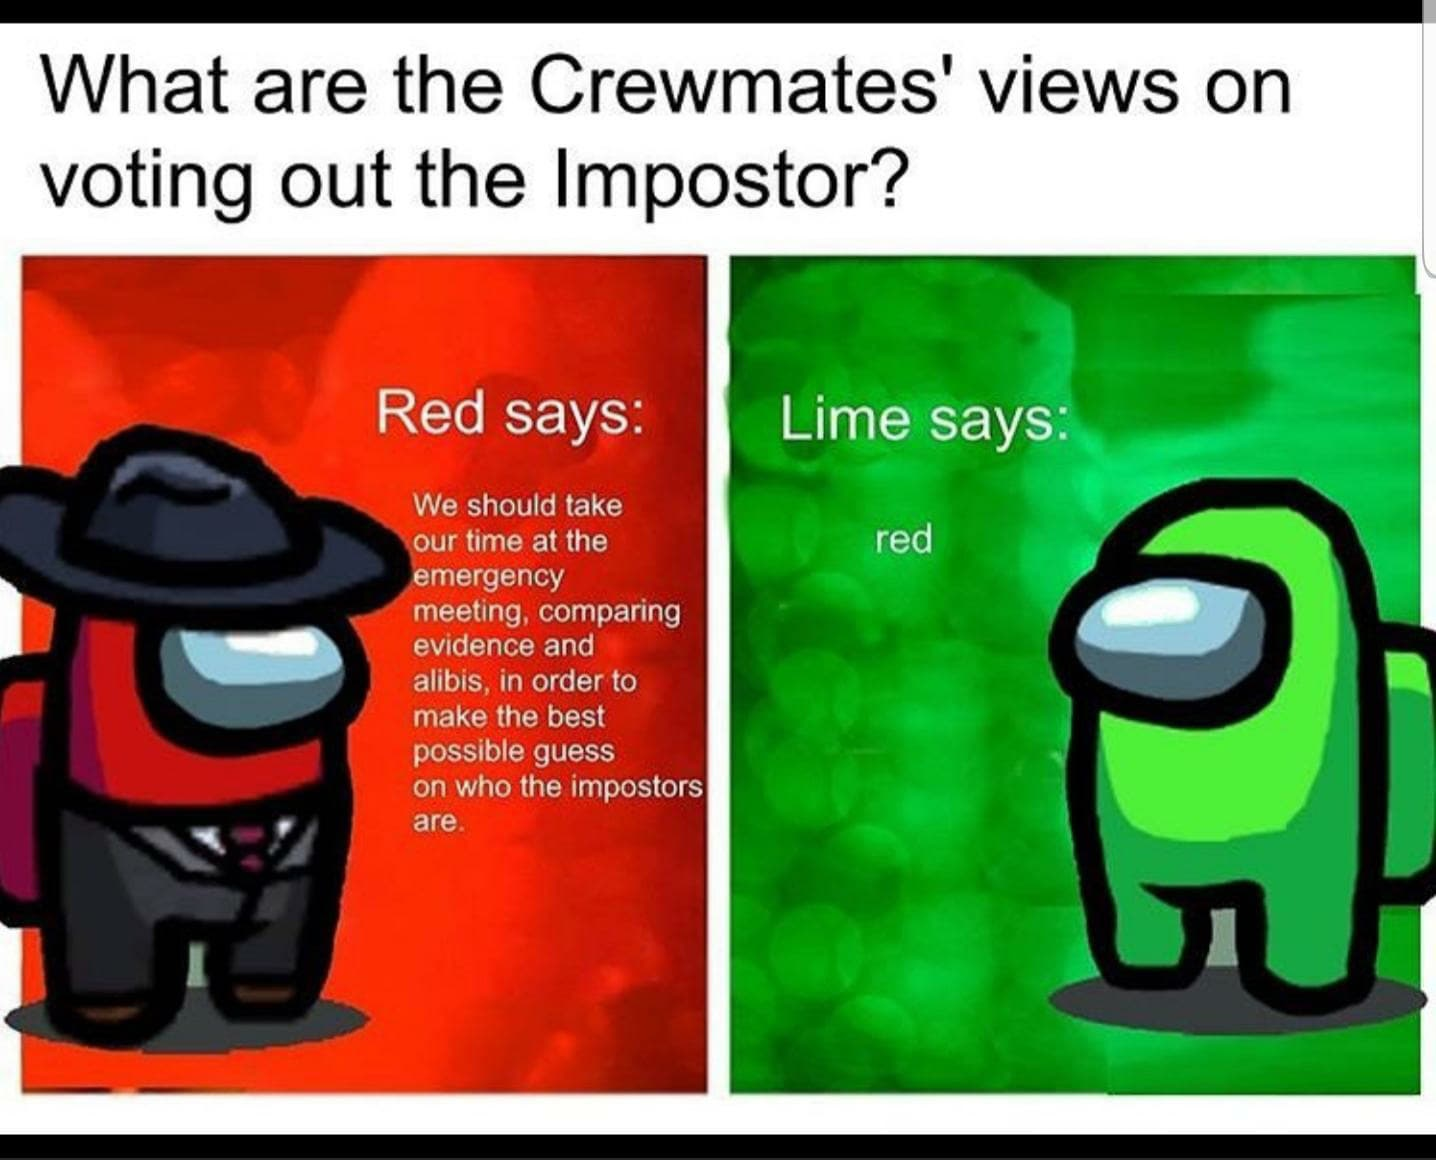 among-us-meme-005-crewmates-views-on-imposter-lime-says ...